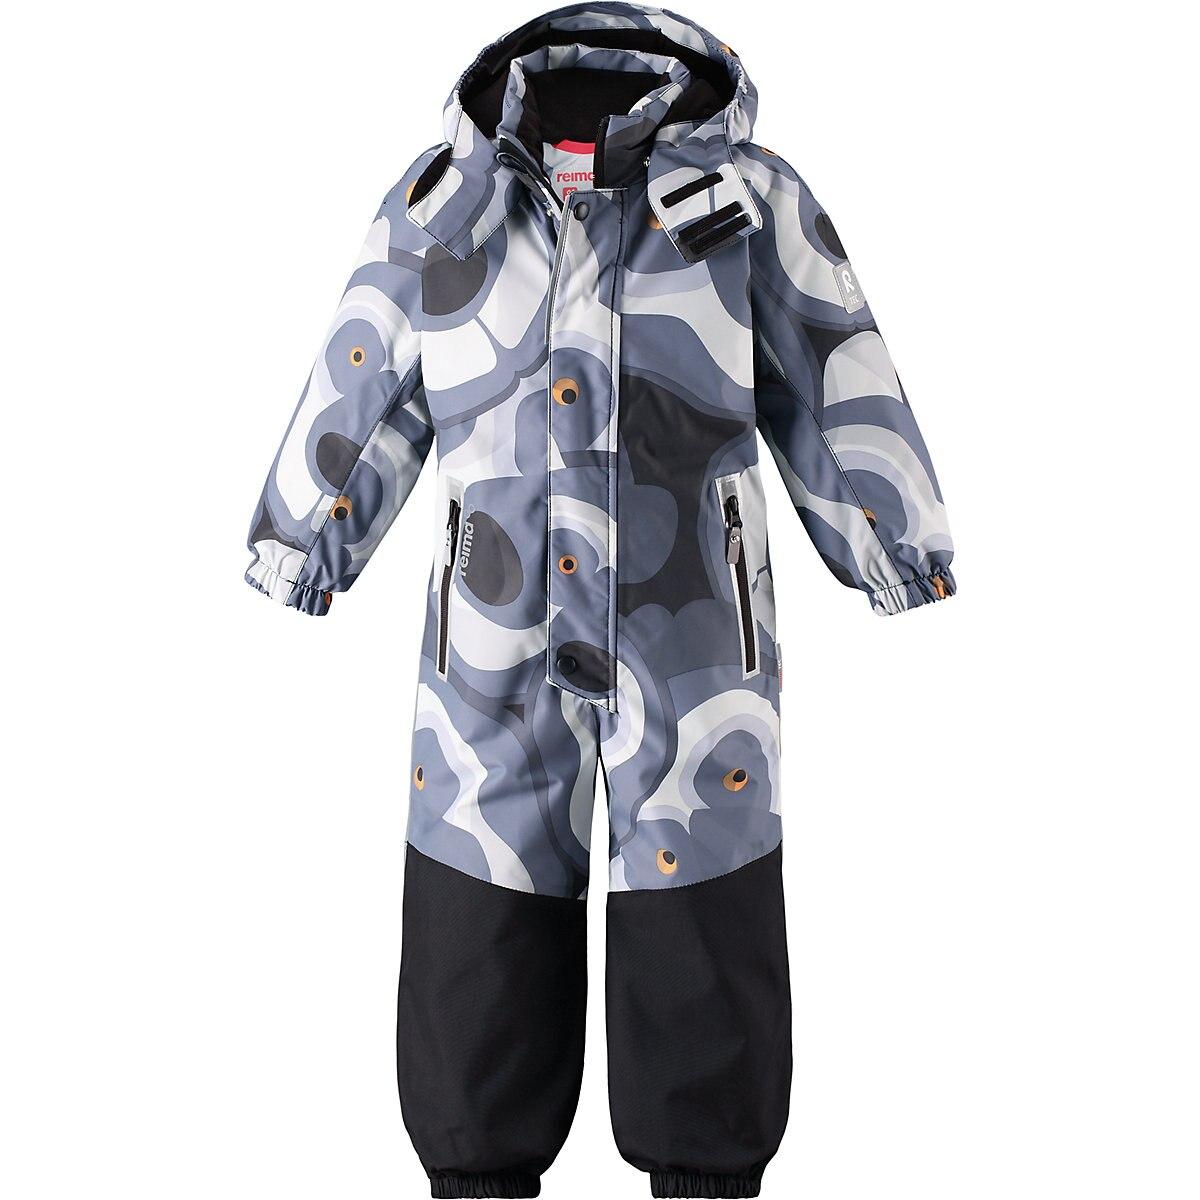 REIMA Overalls  8689150 for boys polyester winter reima overalls 7628261 for boys and girls polyester winter